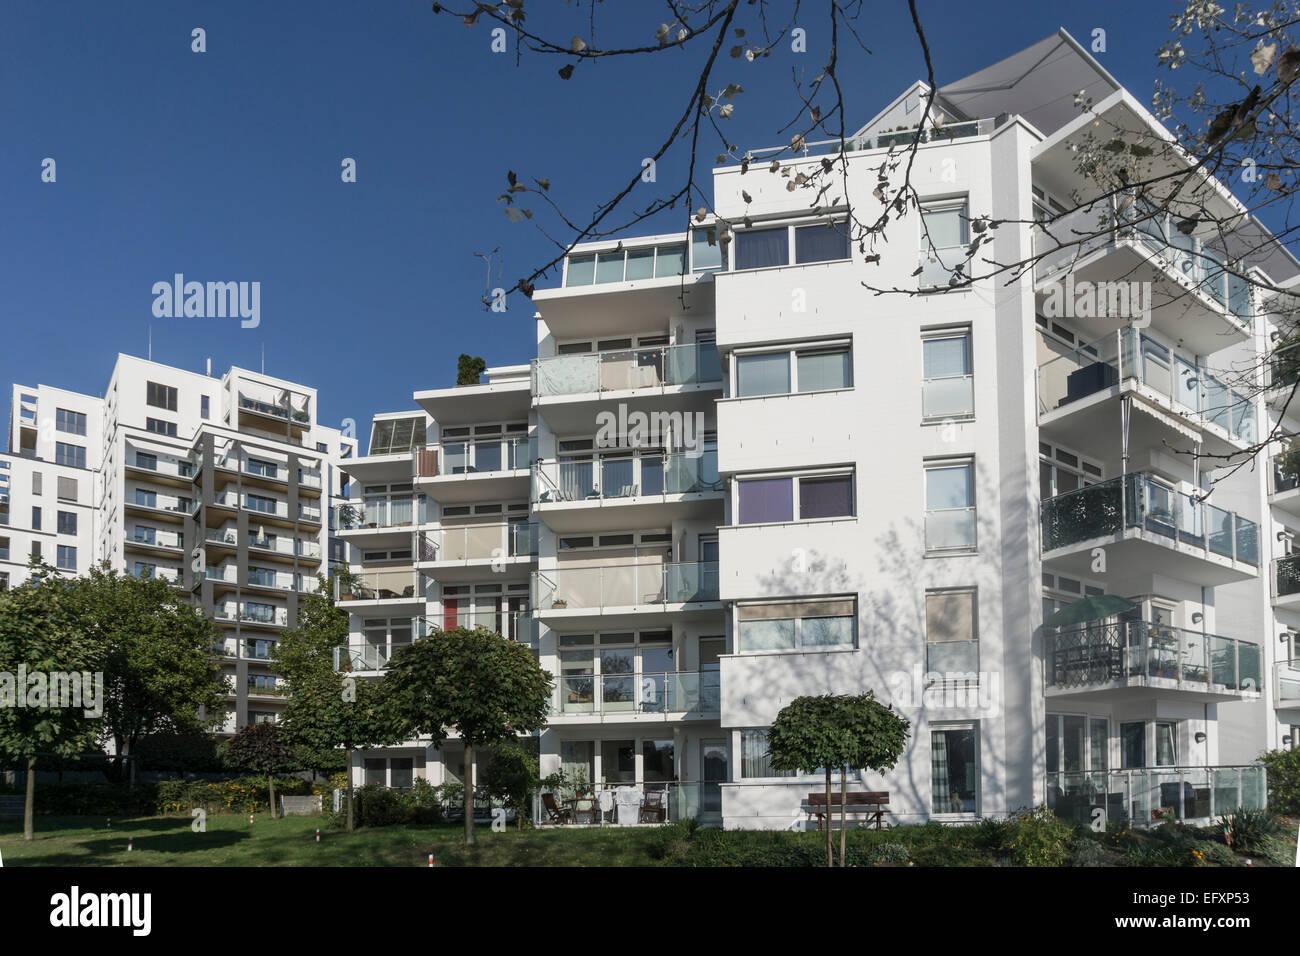 Architettura moderna, Real Estate, Rummelsburger Bucht, Berlino, Germania Immagini Stock